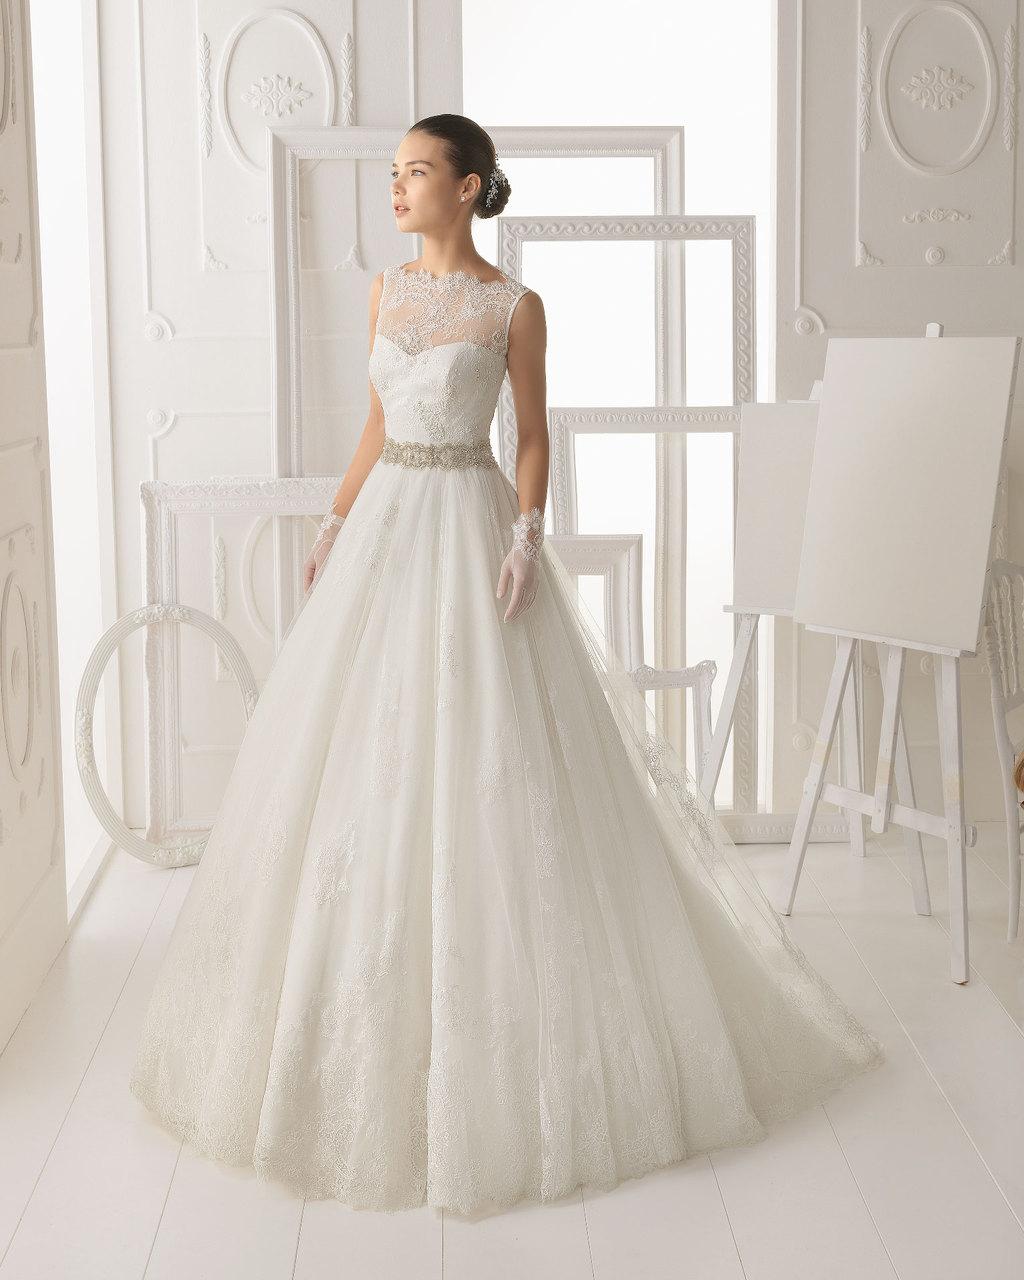 Aire-barcelona-wedding-dress-2014-bridal-omera.full